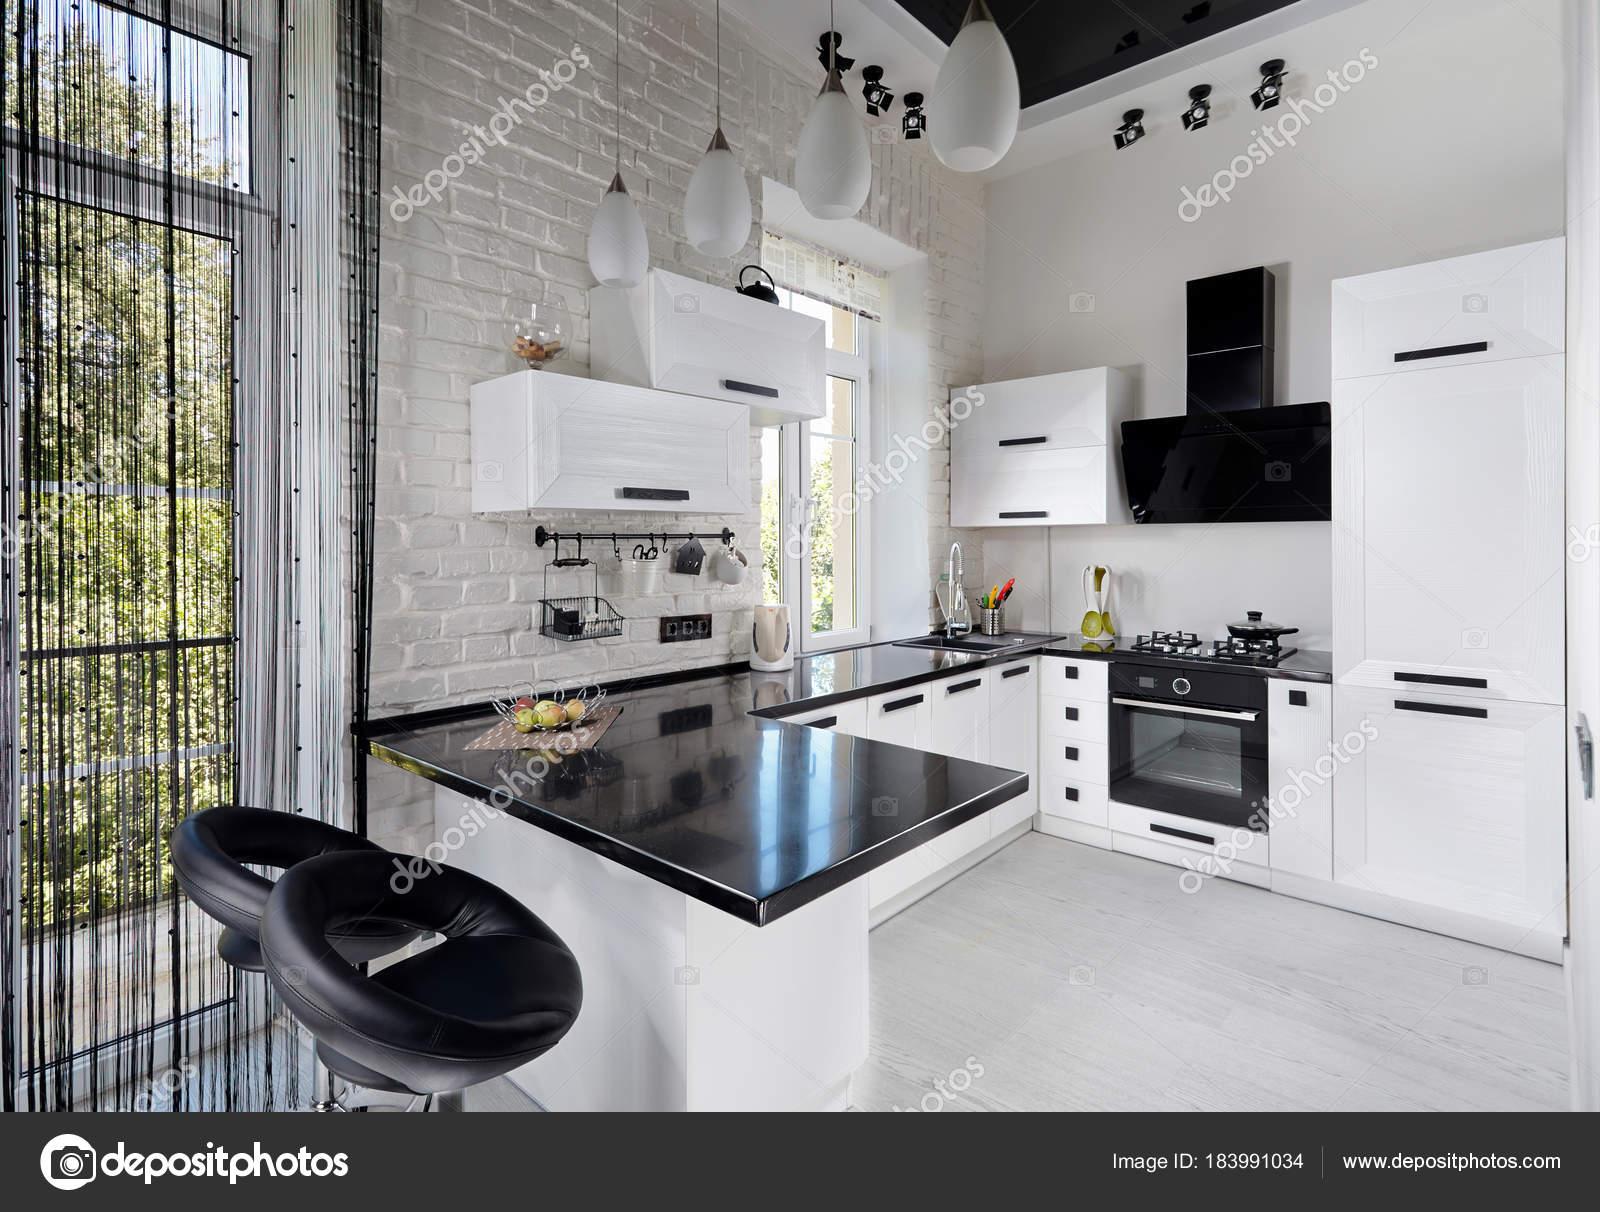 Moderne Keuken Kleuren : Moderne keuken in lichte kleuren u2014 stockfoto © r yosha #183991034